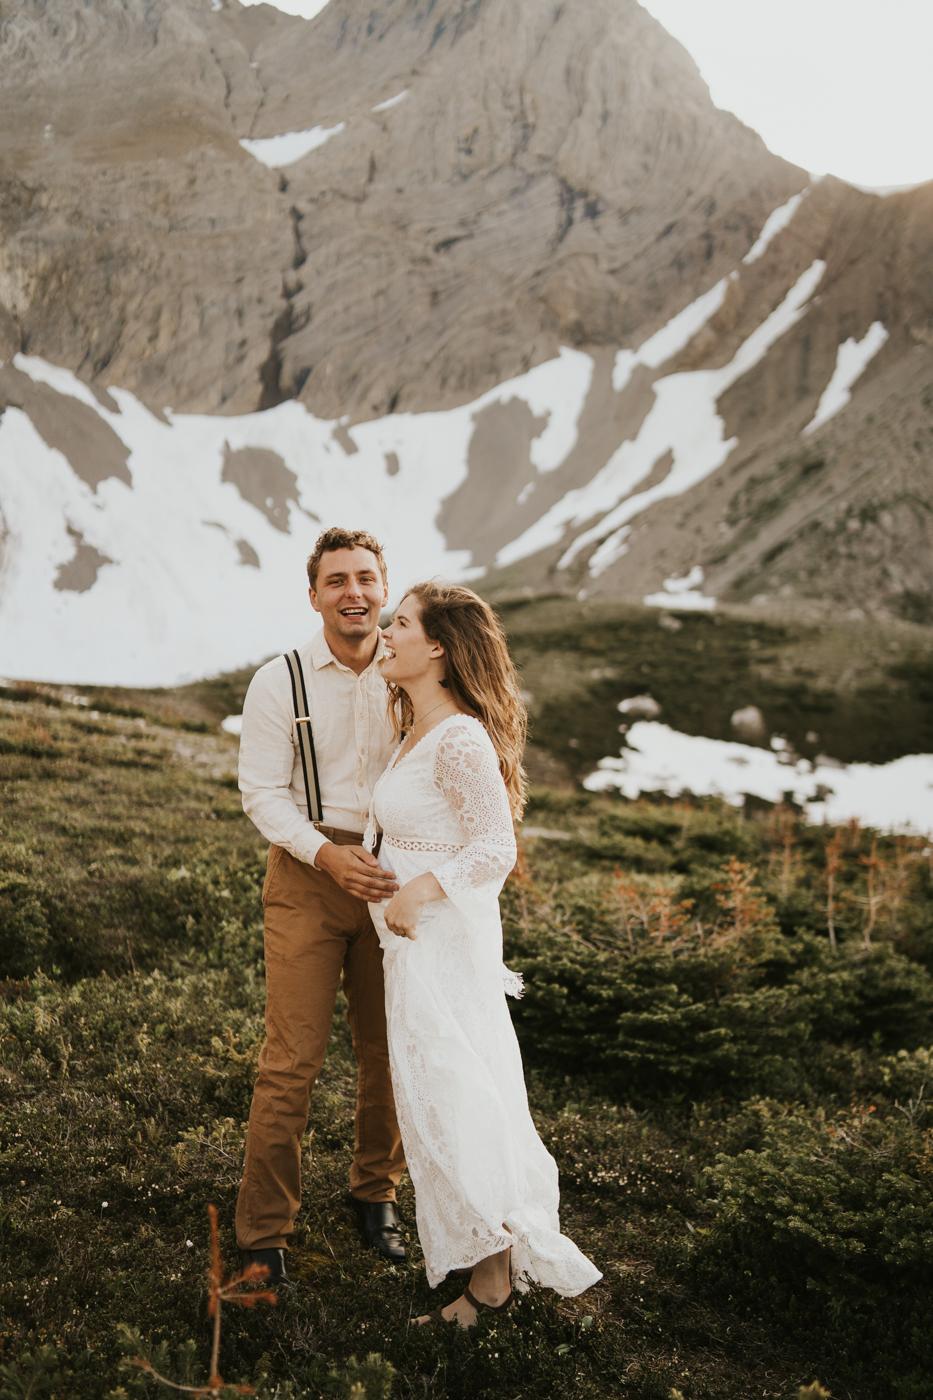 tyraephotography_photographer_wedding_elopement_engagement_photography-08022.jpg